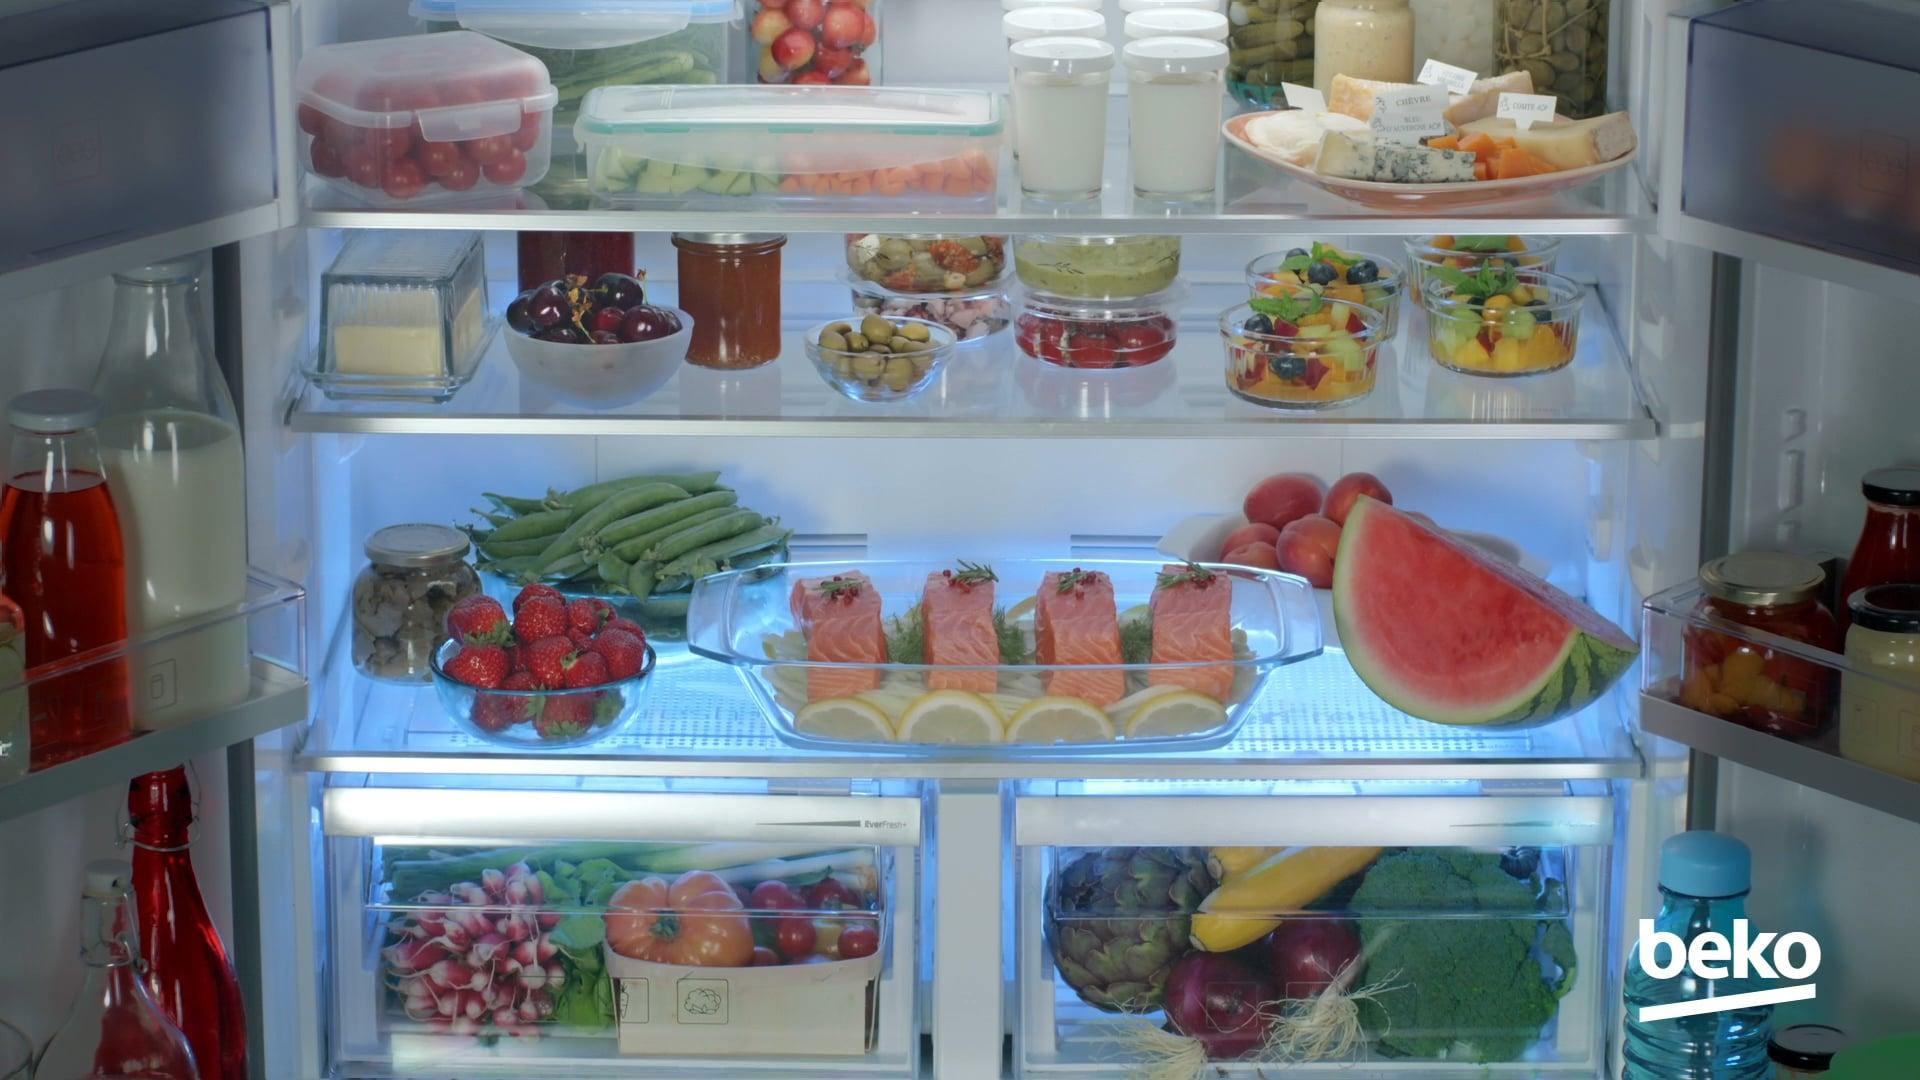 Beko - Réfrigérateur